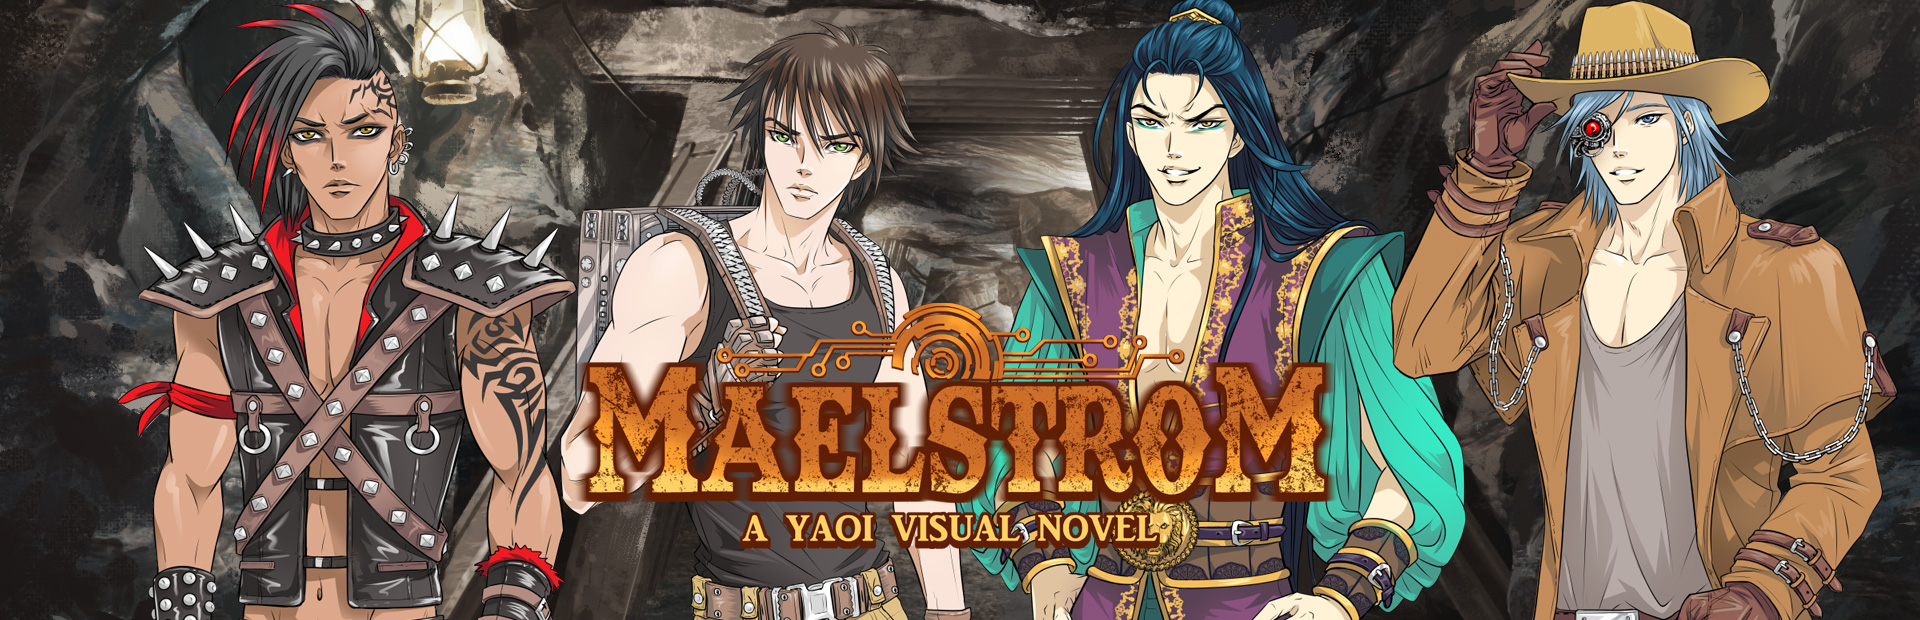 Maelstrom: A Yaoi Visual Novel Demo